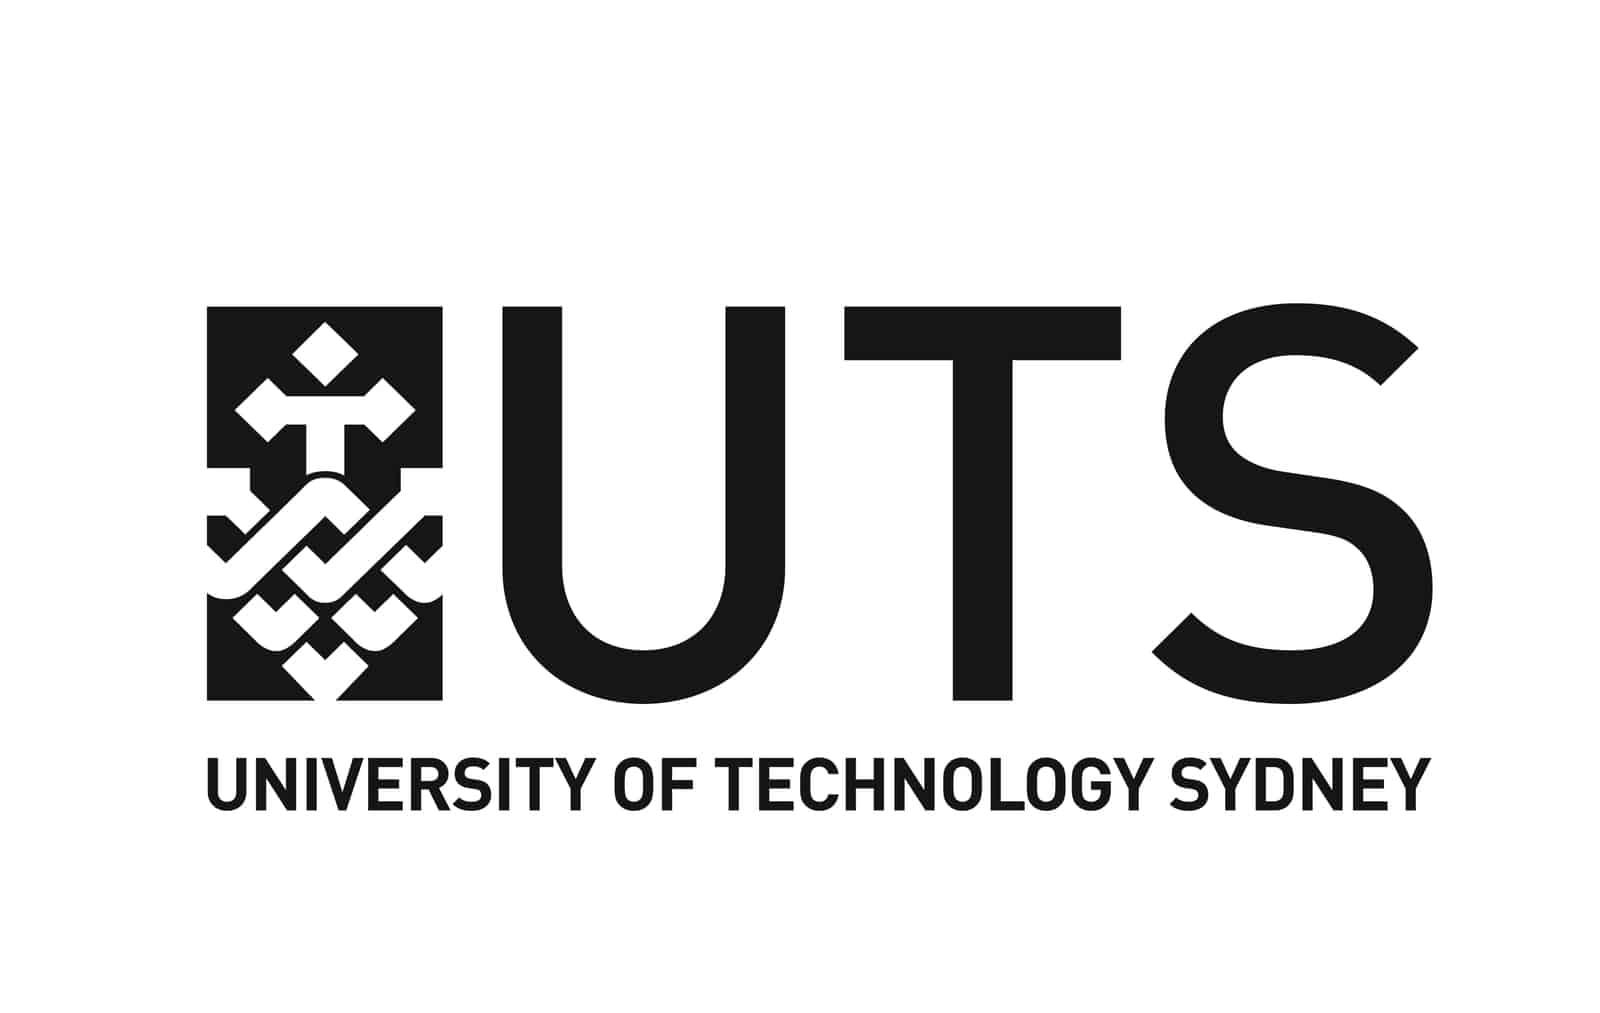 Black UTS logo p 1600 1